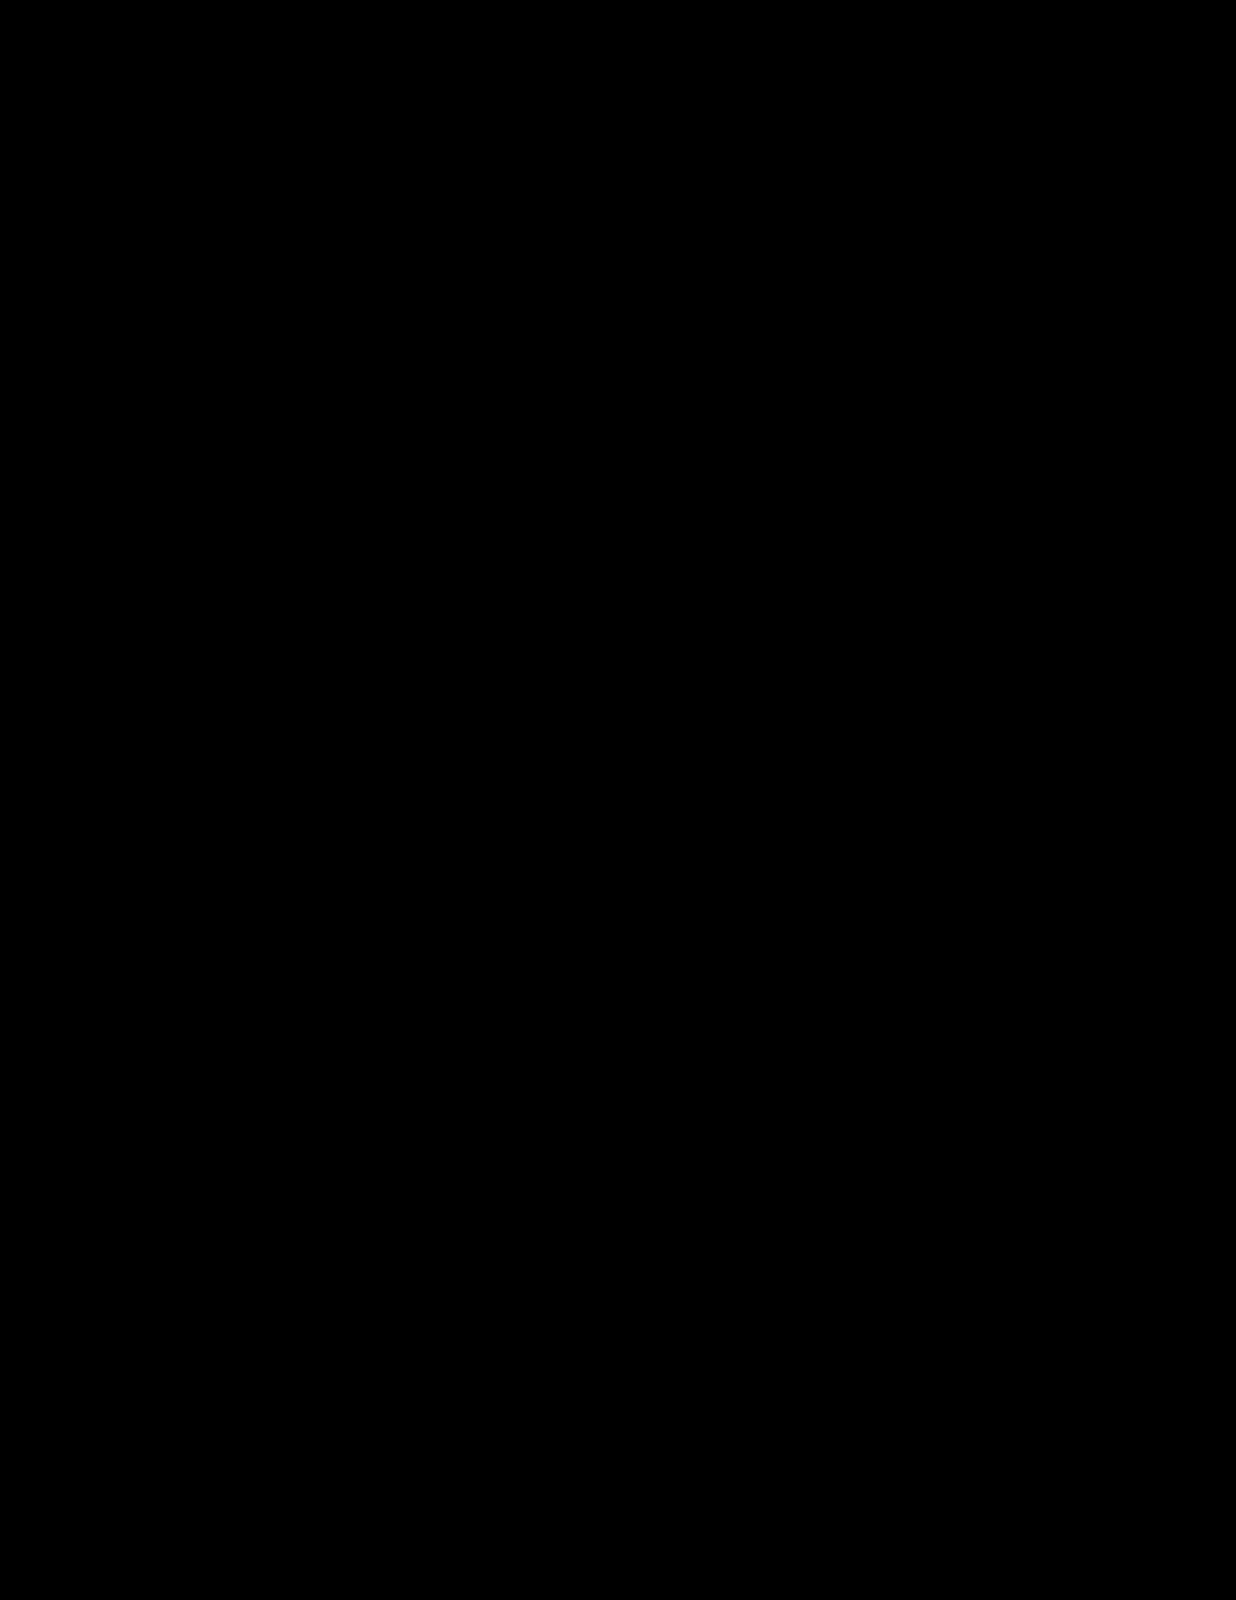 Diegosax Mi Burrito Sabanero De Hugo Blanco Partitura Para Saxofon Violin Clarinete Trompeta Saxo Tenor Saxo Soprano Y Trombon Partituras De Villancicos Populares Mi Burrito Sabanero Sheet Music Christmas Song